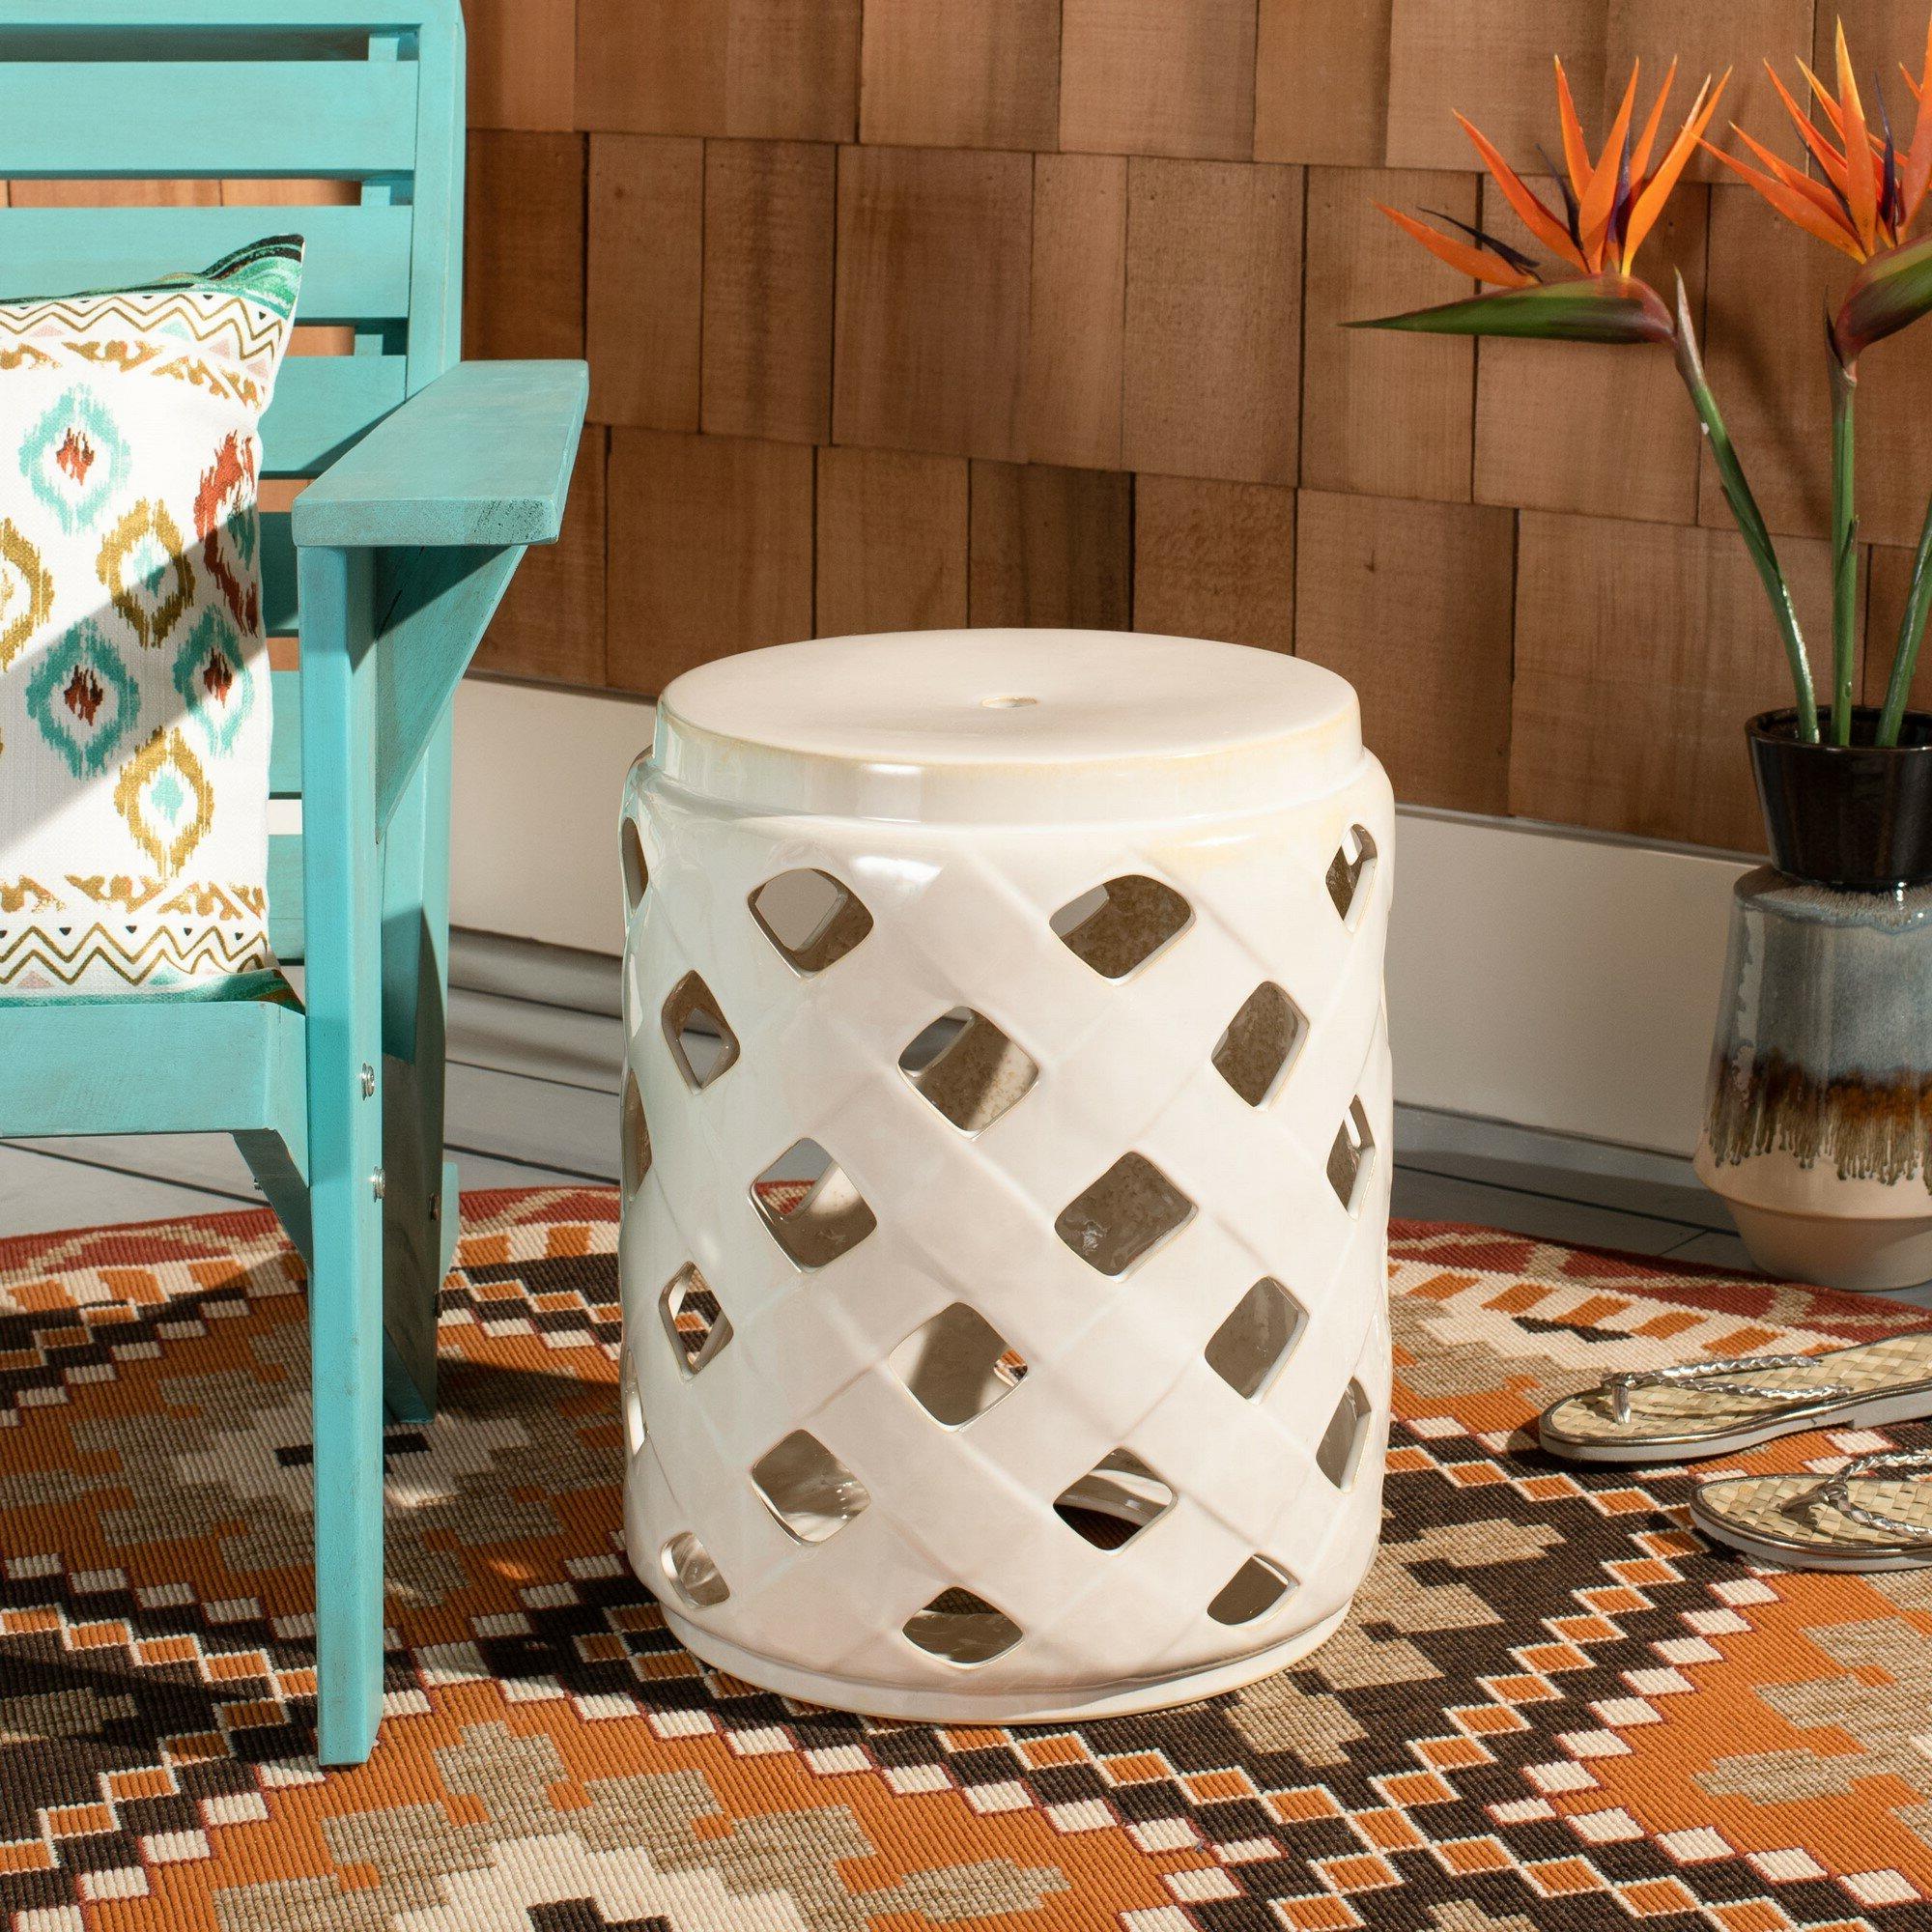 Favorite Arista Ceramic Garden Stools In Beige Garden Accent Stools You'll Love In (View 10 of 30)